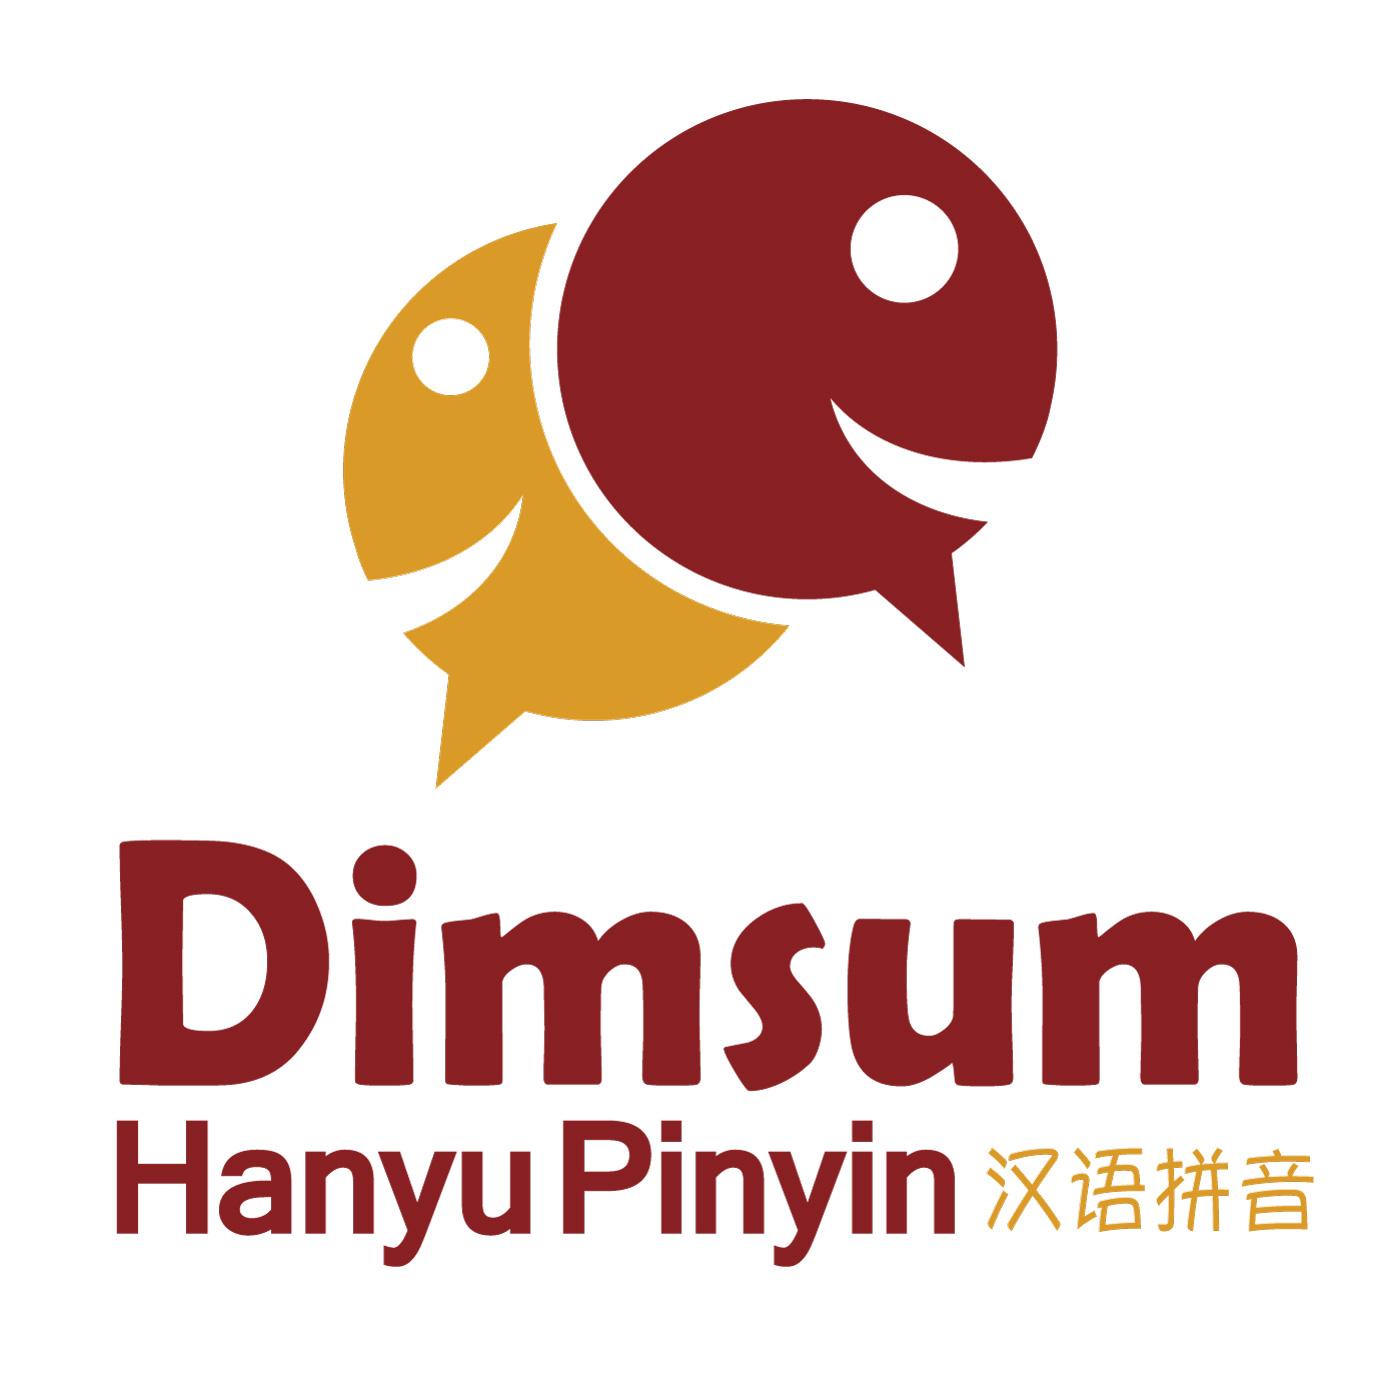 Dimsum Hanyu Pinyin - Learn Mandarin Chinese